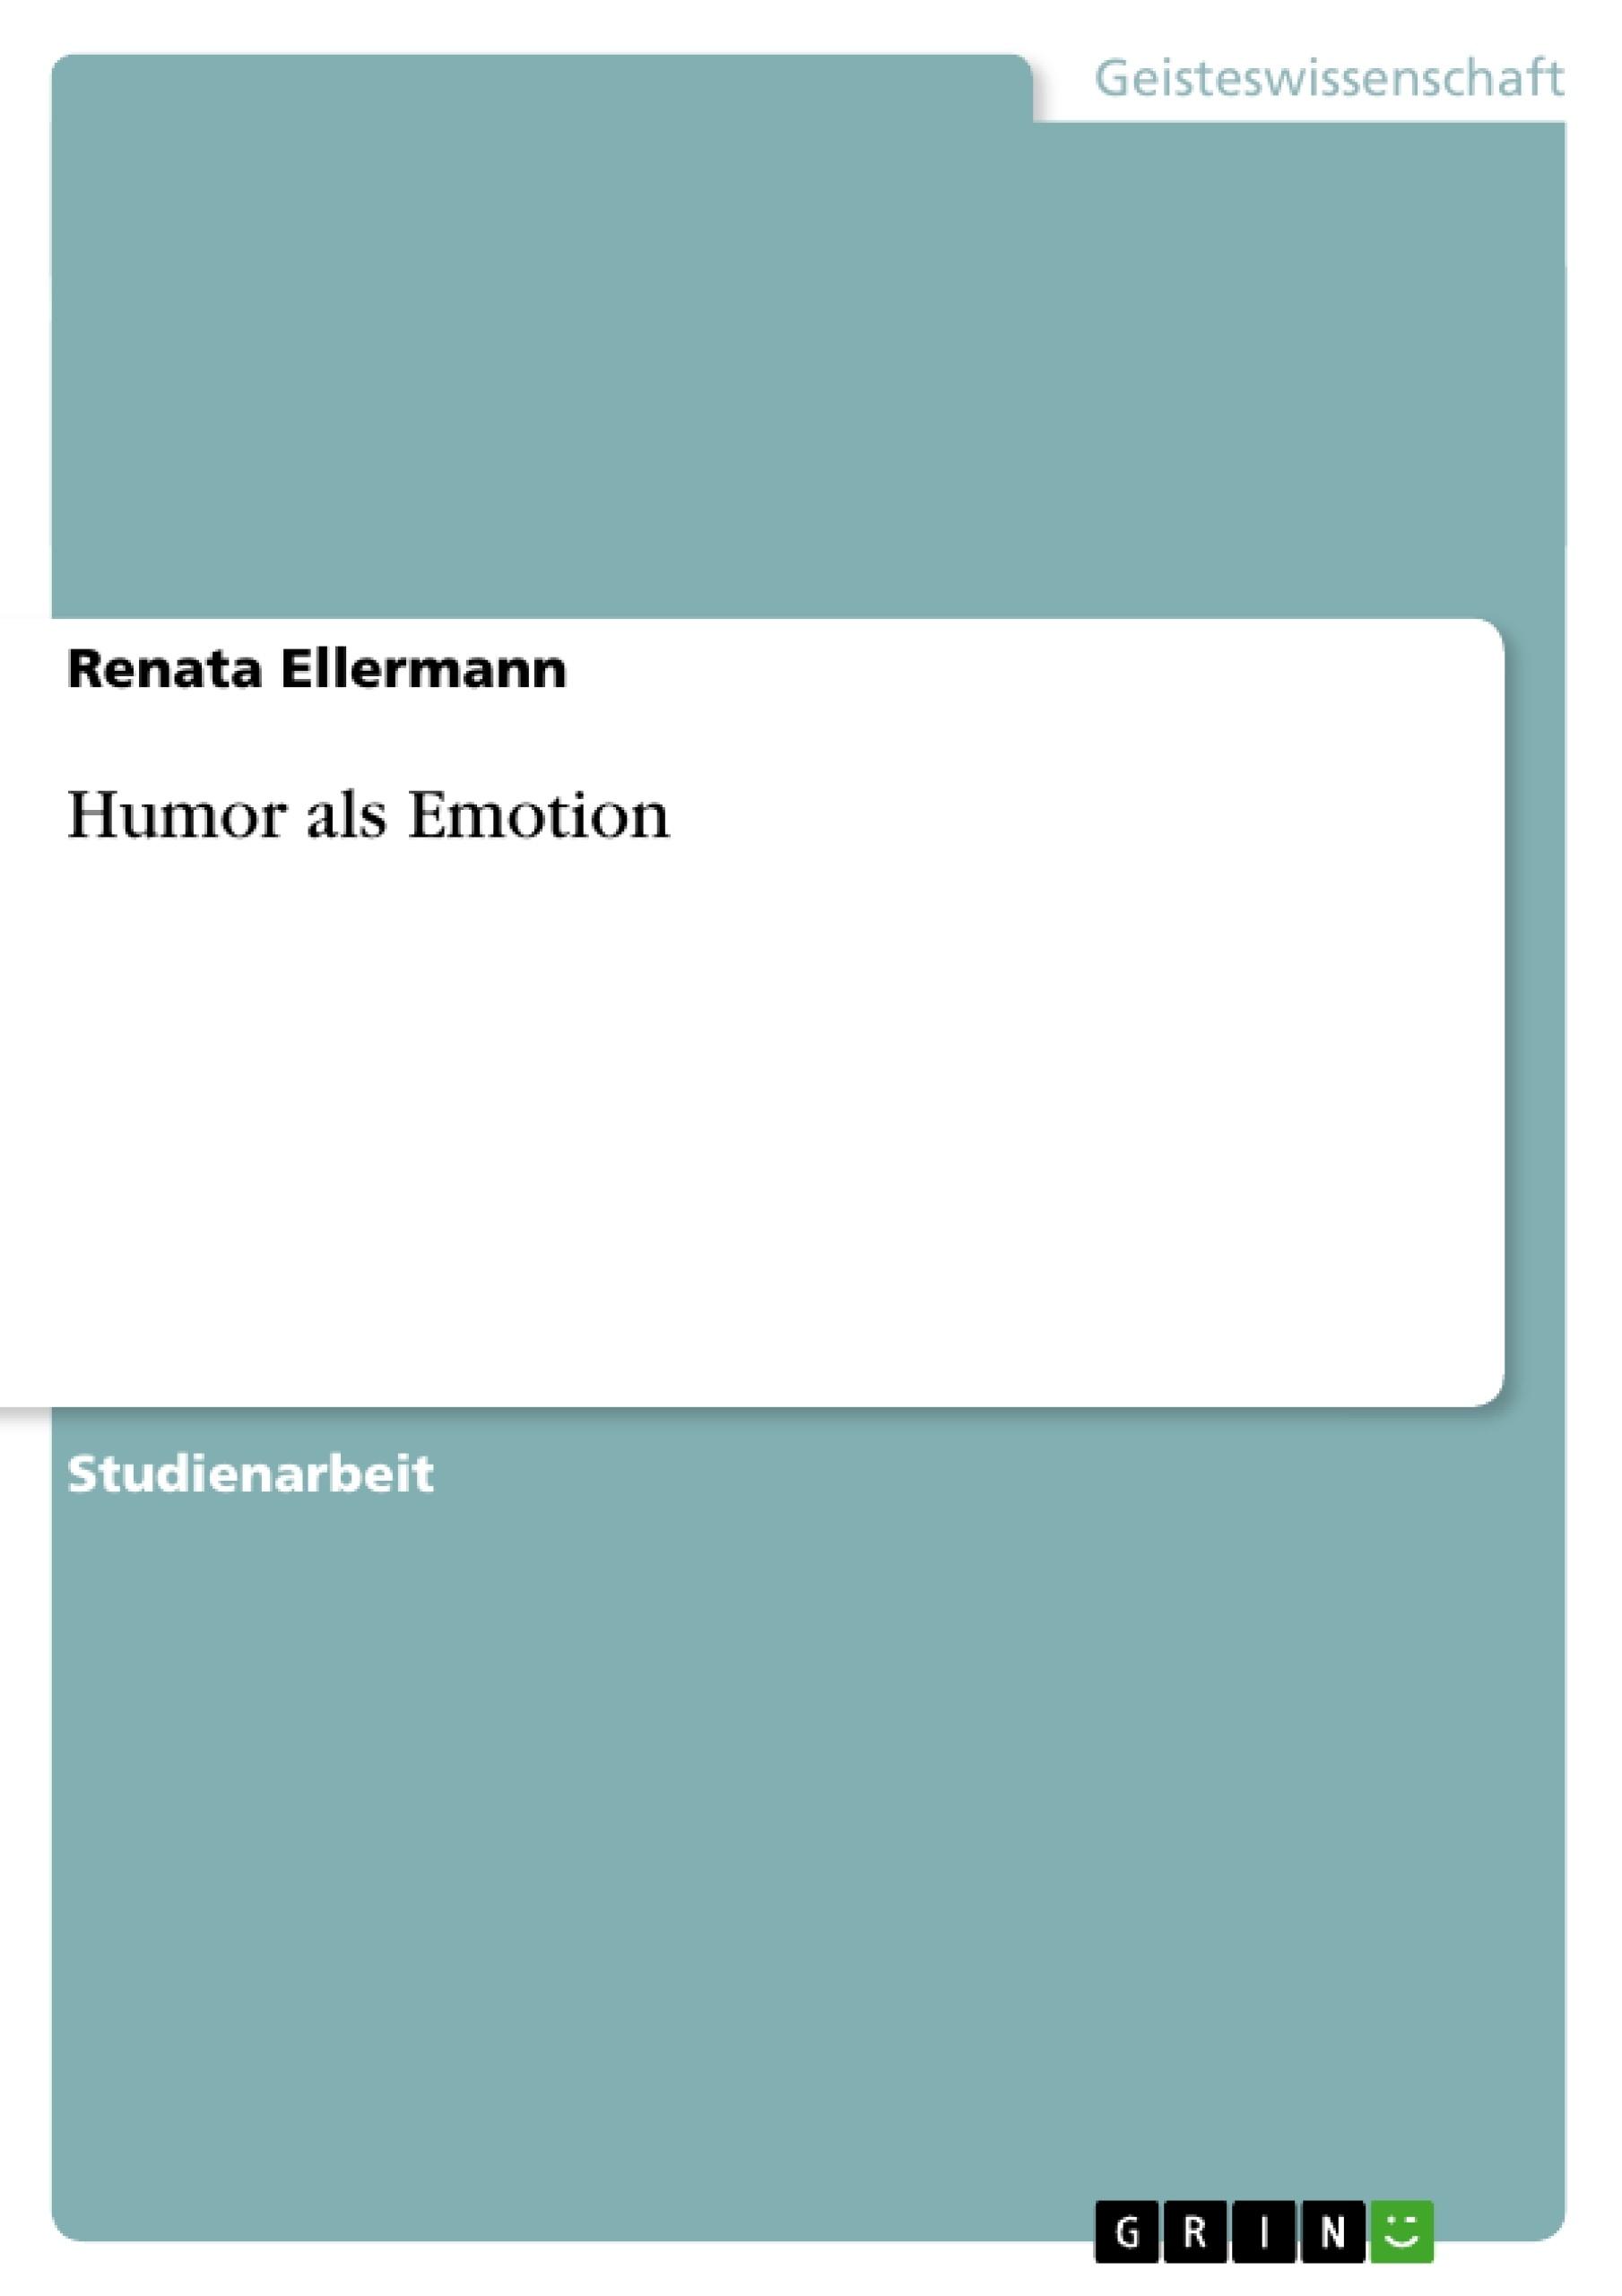 Titel: Humor als Emotion